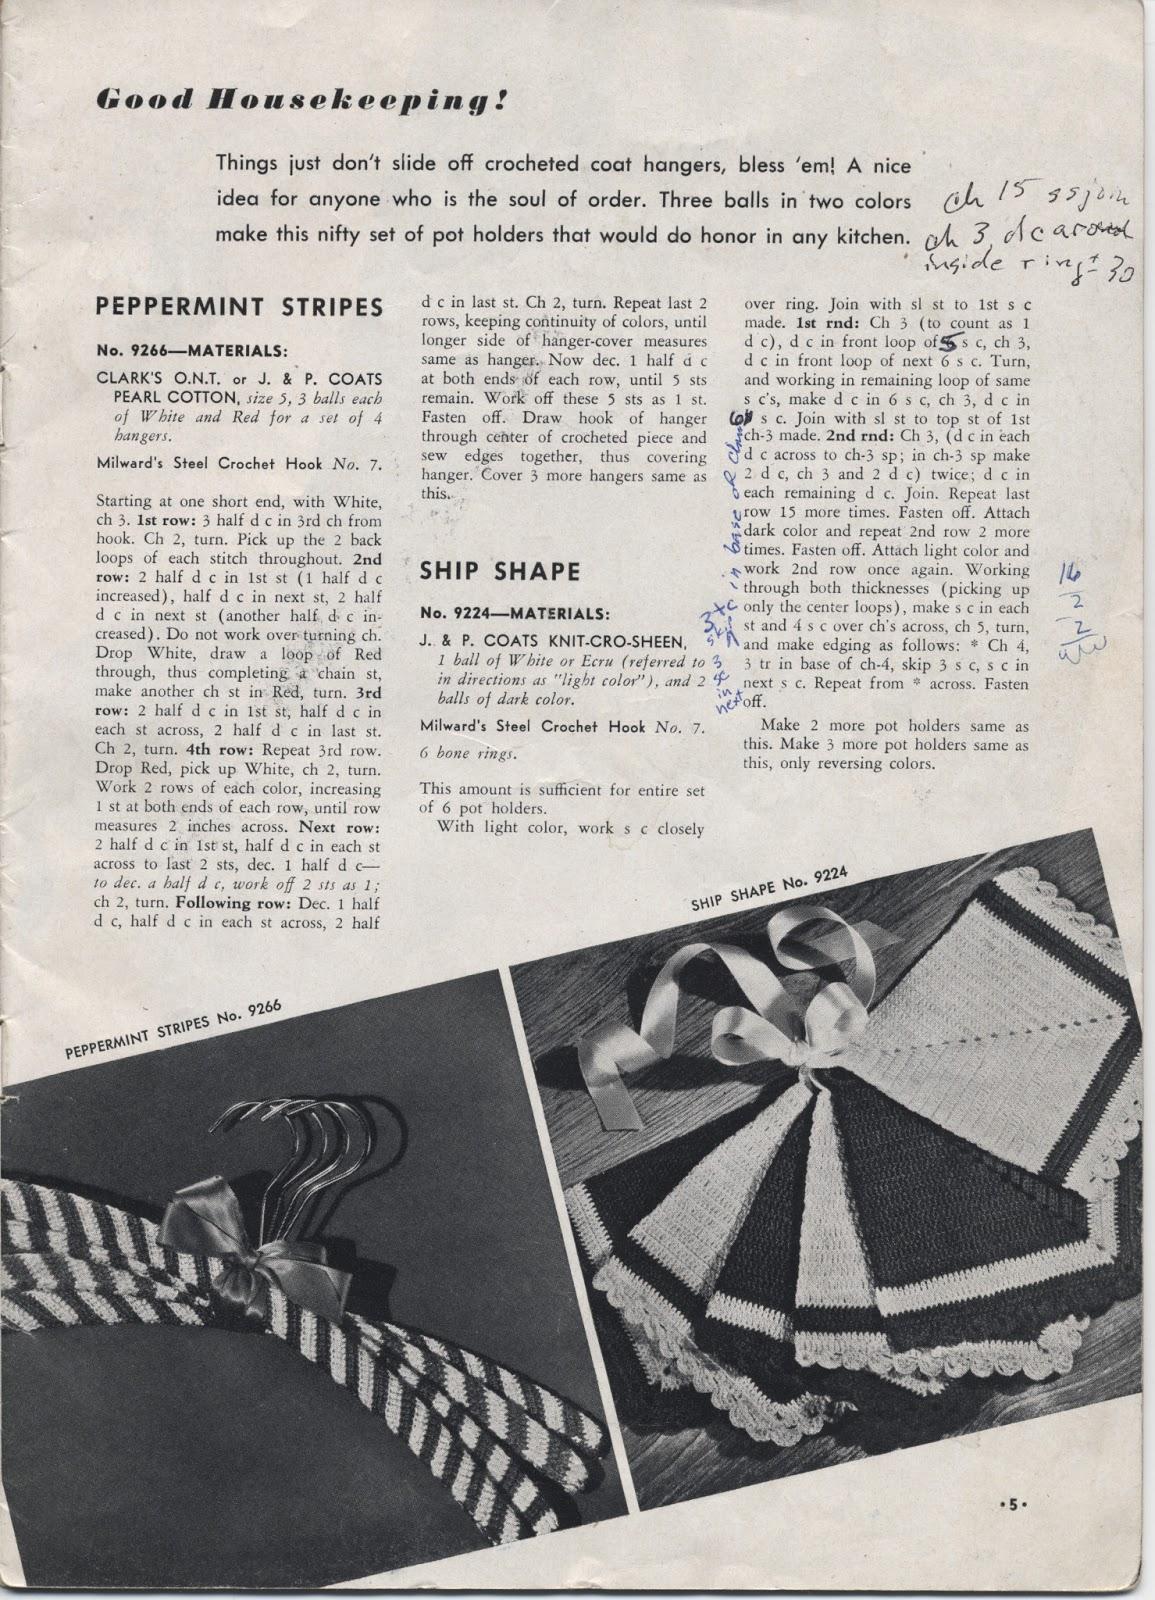 Firesign Farm Crocheted Vintage Diamond Potholders